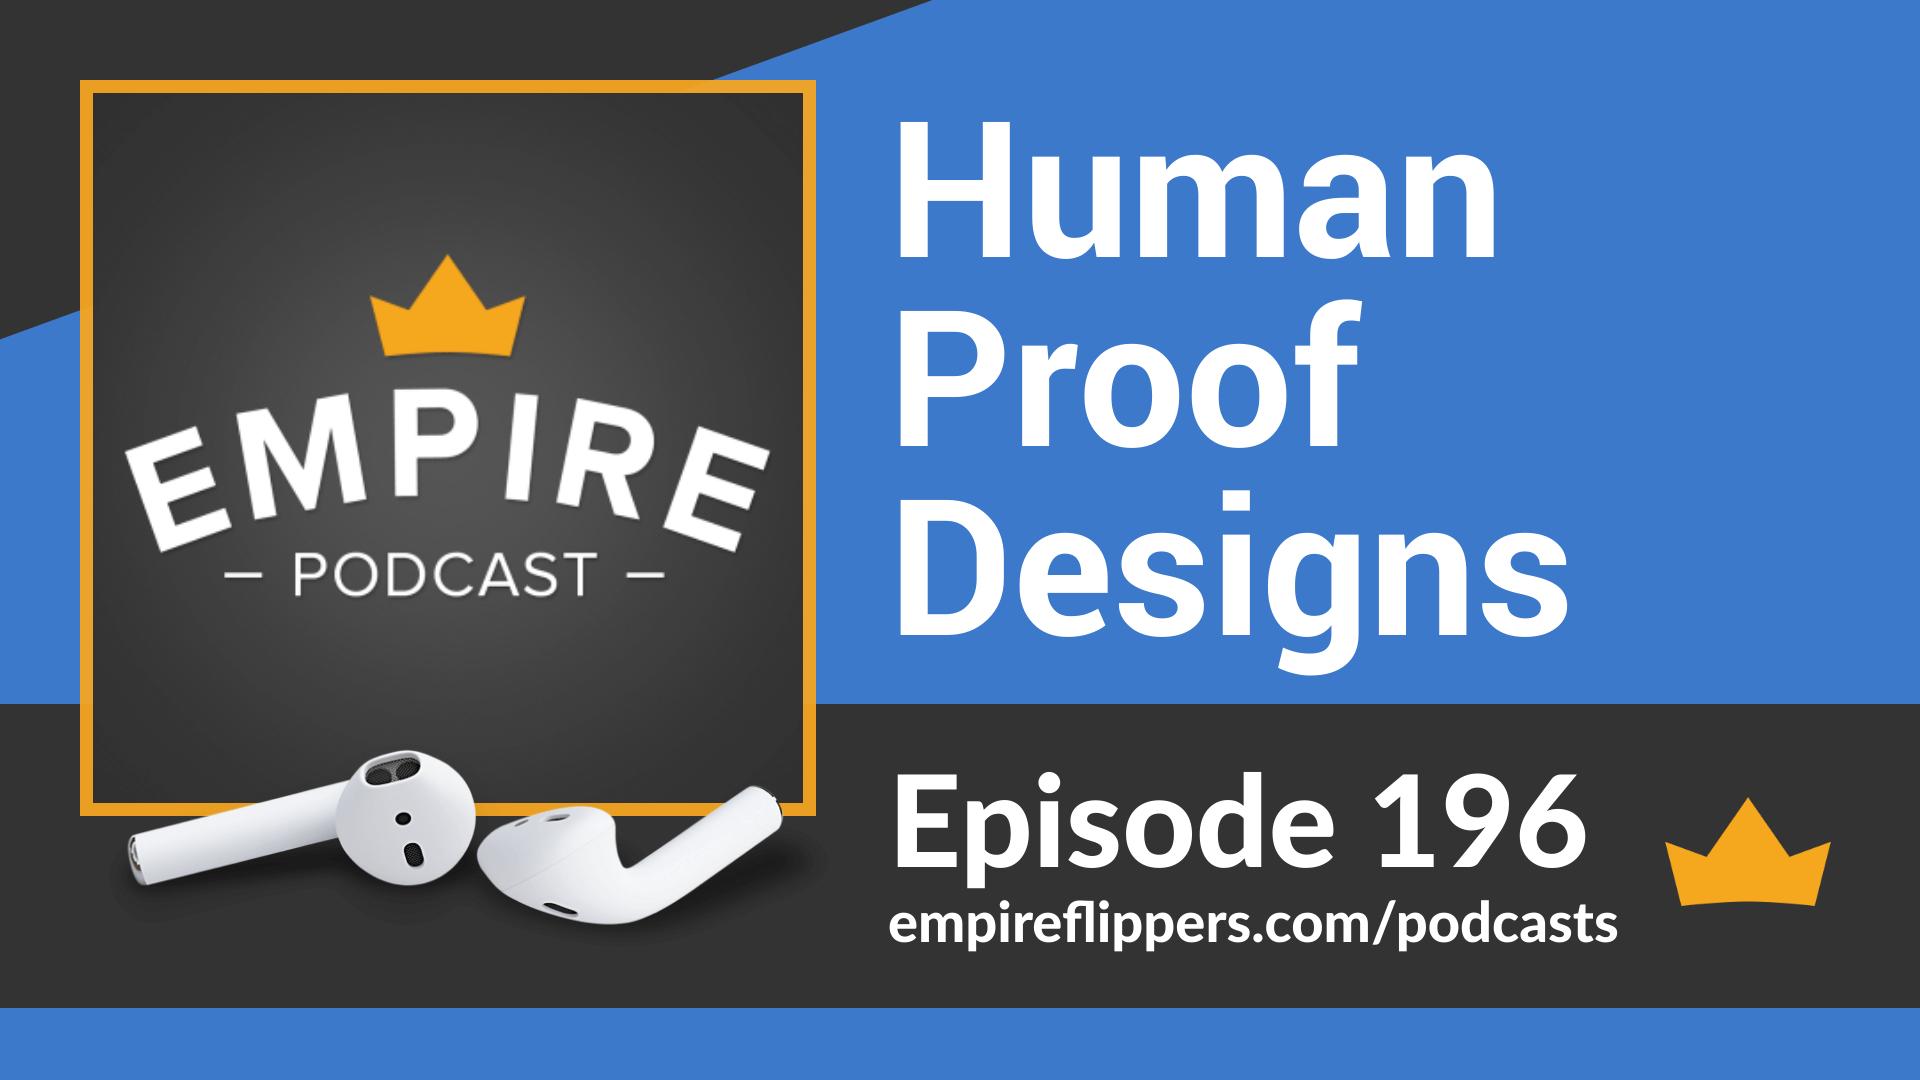 EFP 196 - Human Proof Designs